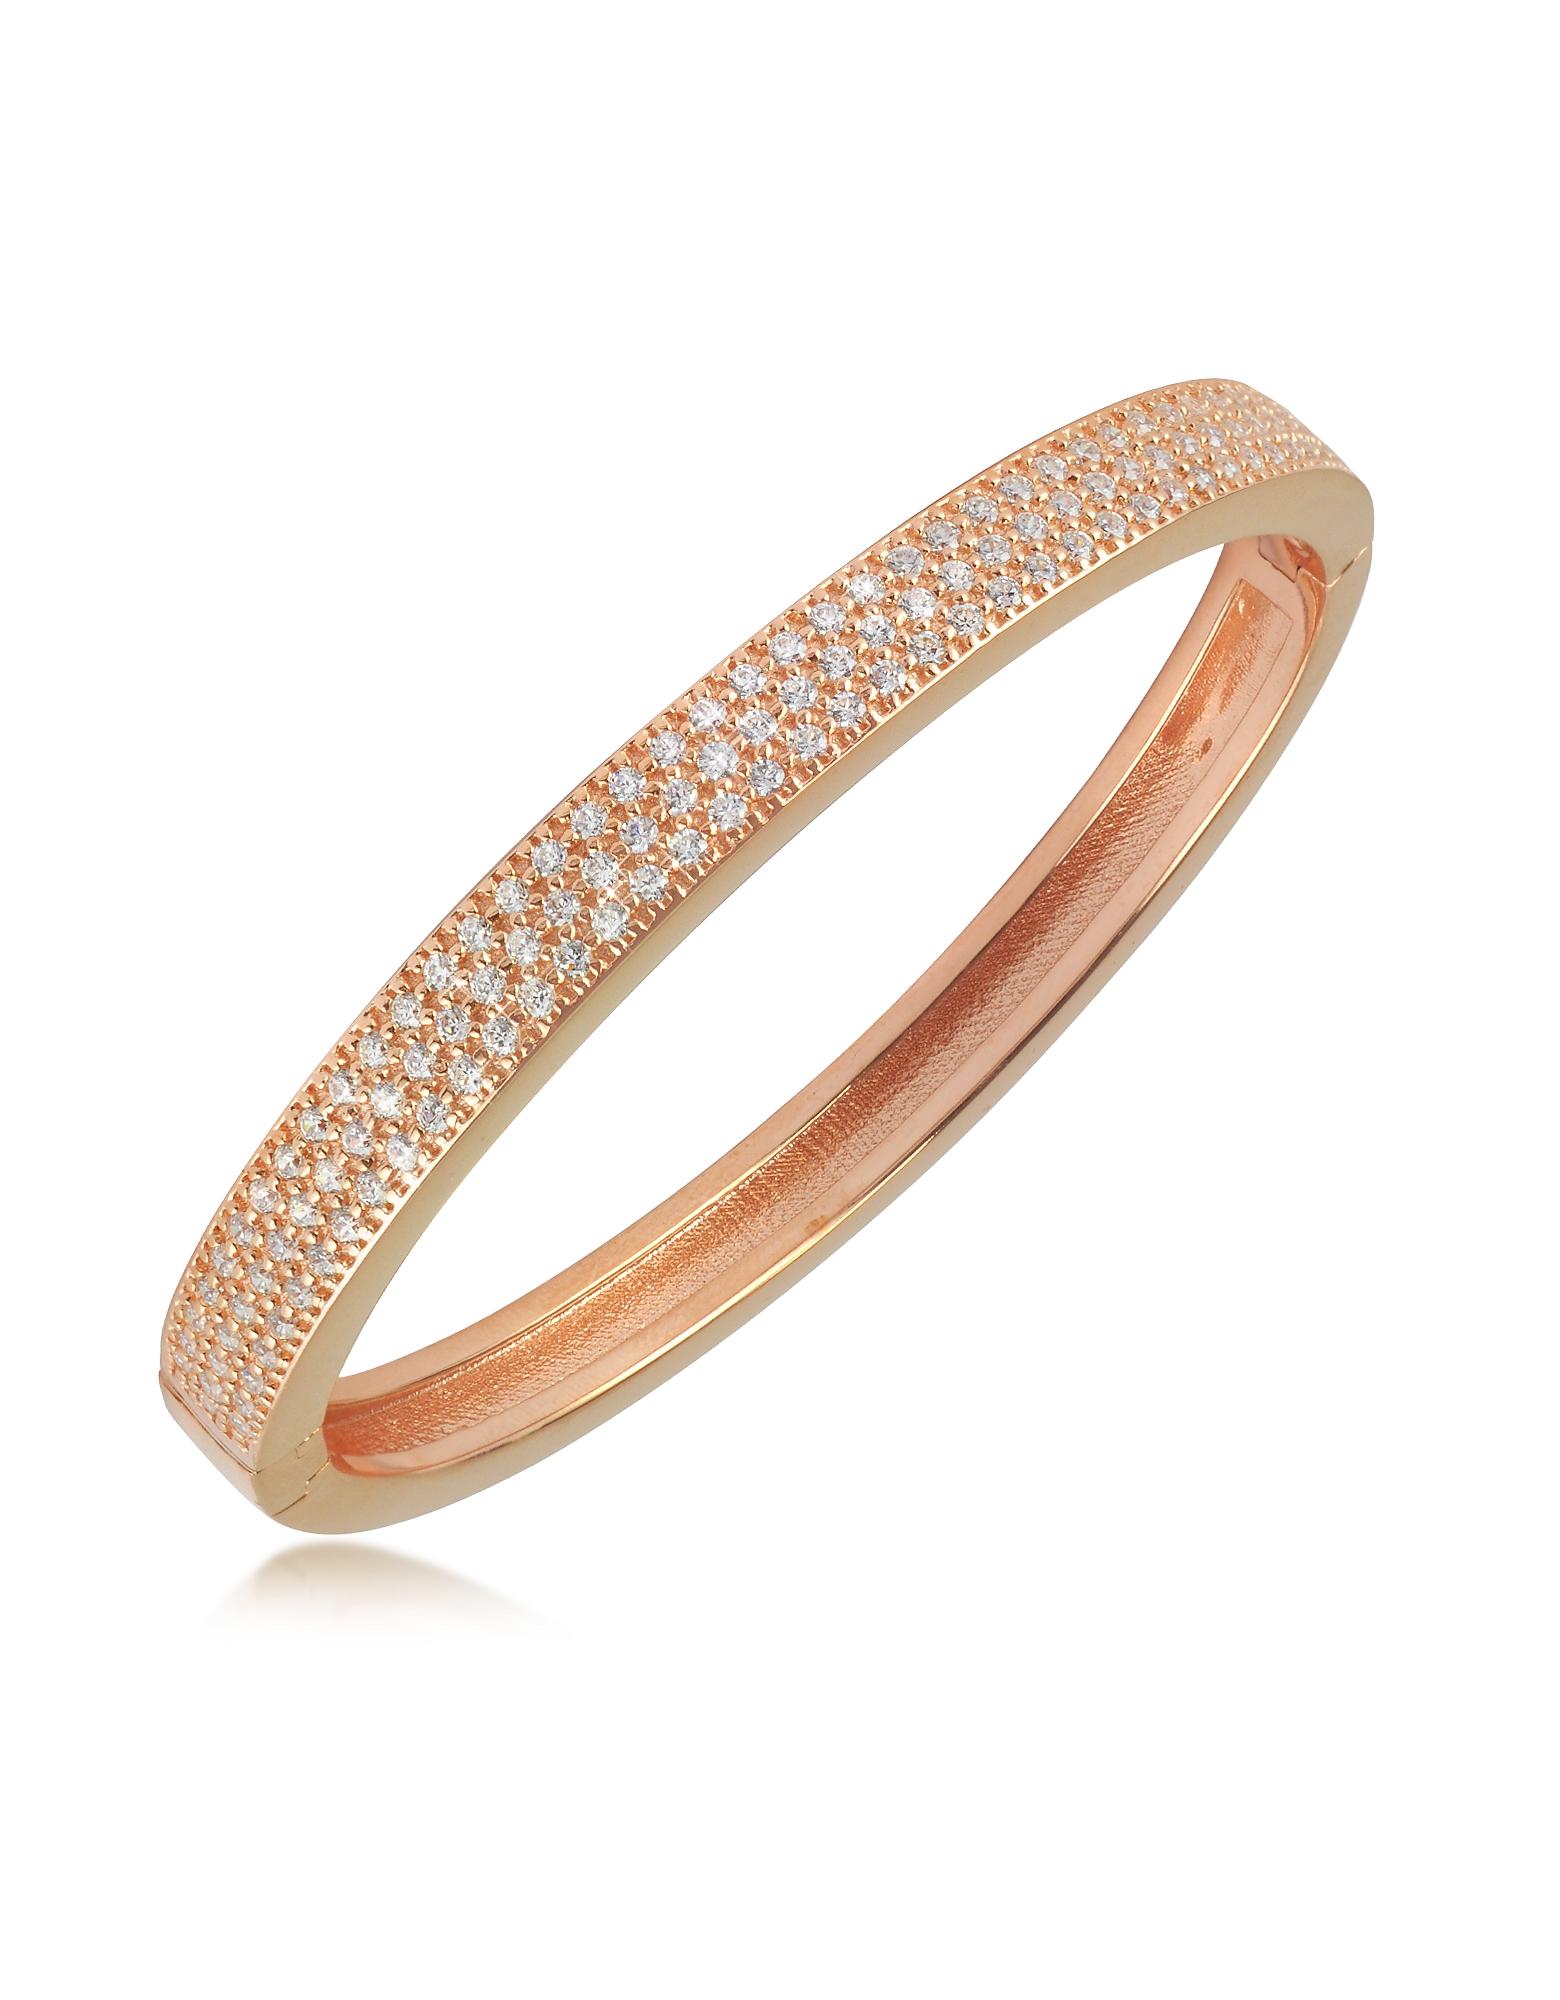 Azhar Bracelets, Cubic Zirconia Bracelet